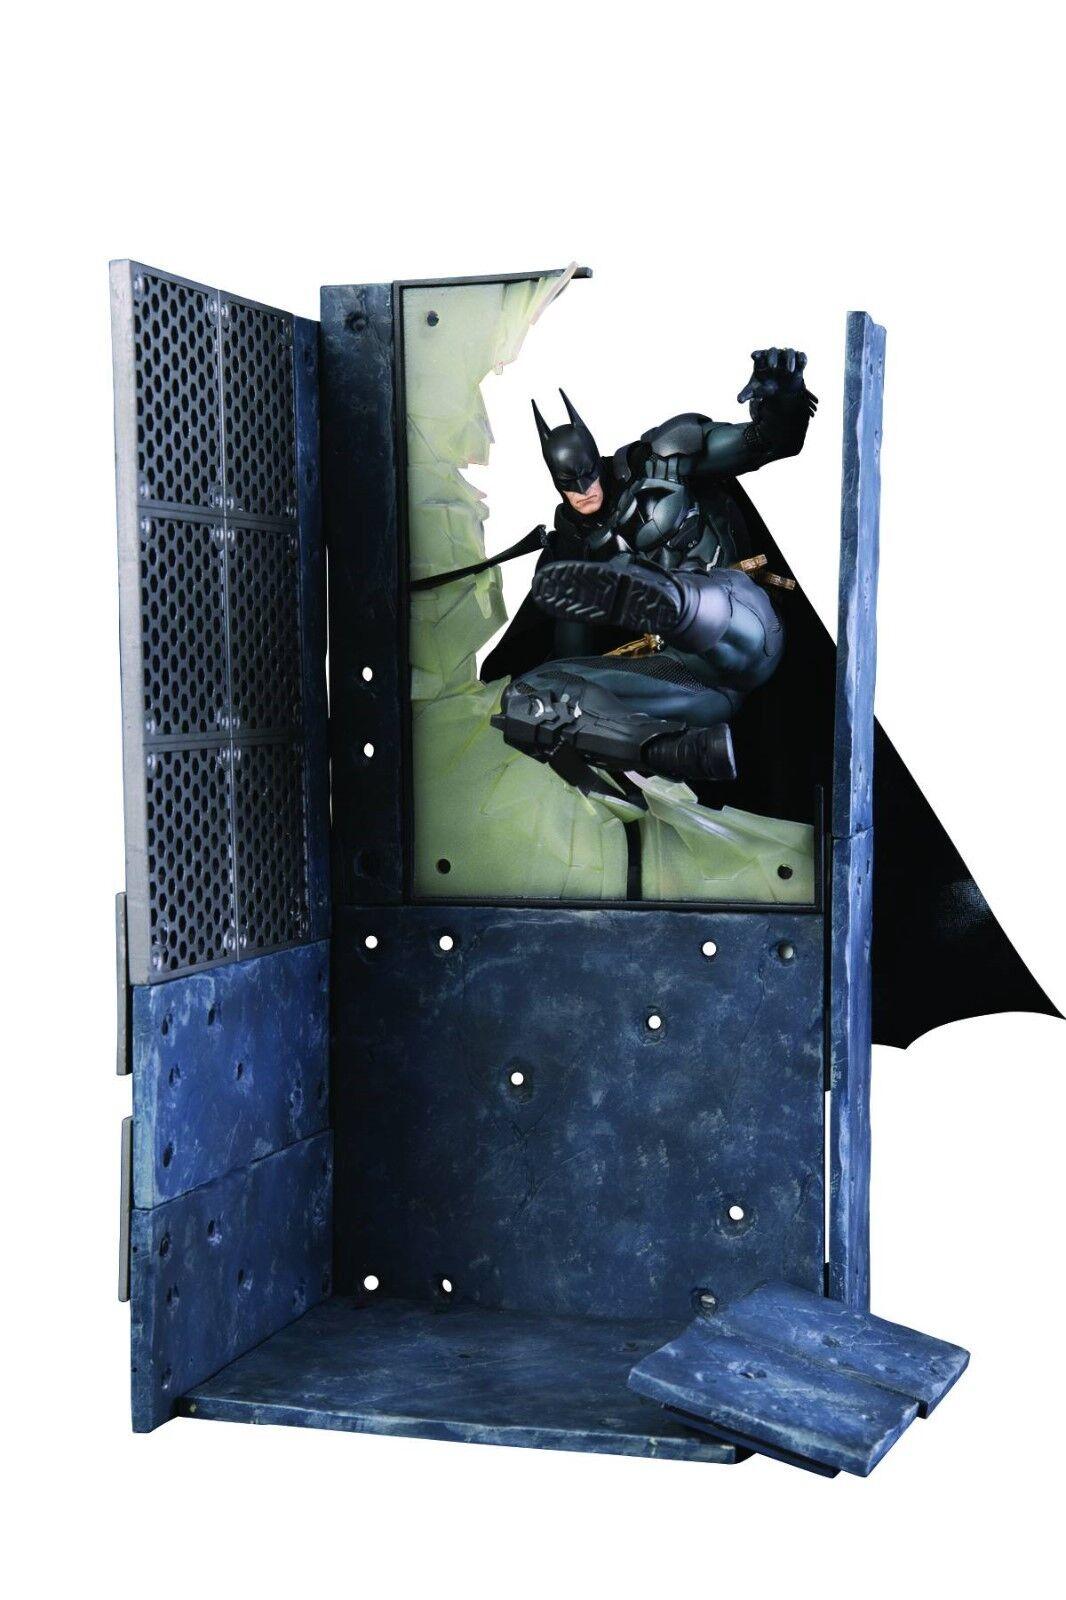 BATMAN ARKHAM 2 KNIGHT GAME BATMAN AND ARKHAM KNIGHT ARTFX+ 2 ARKHAM STATUE SET e8677a